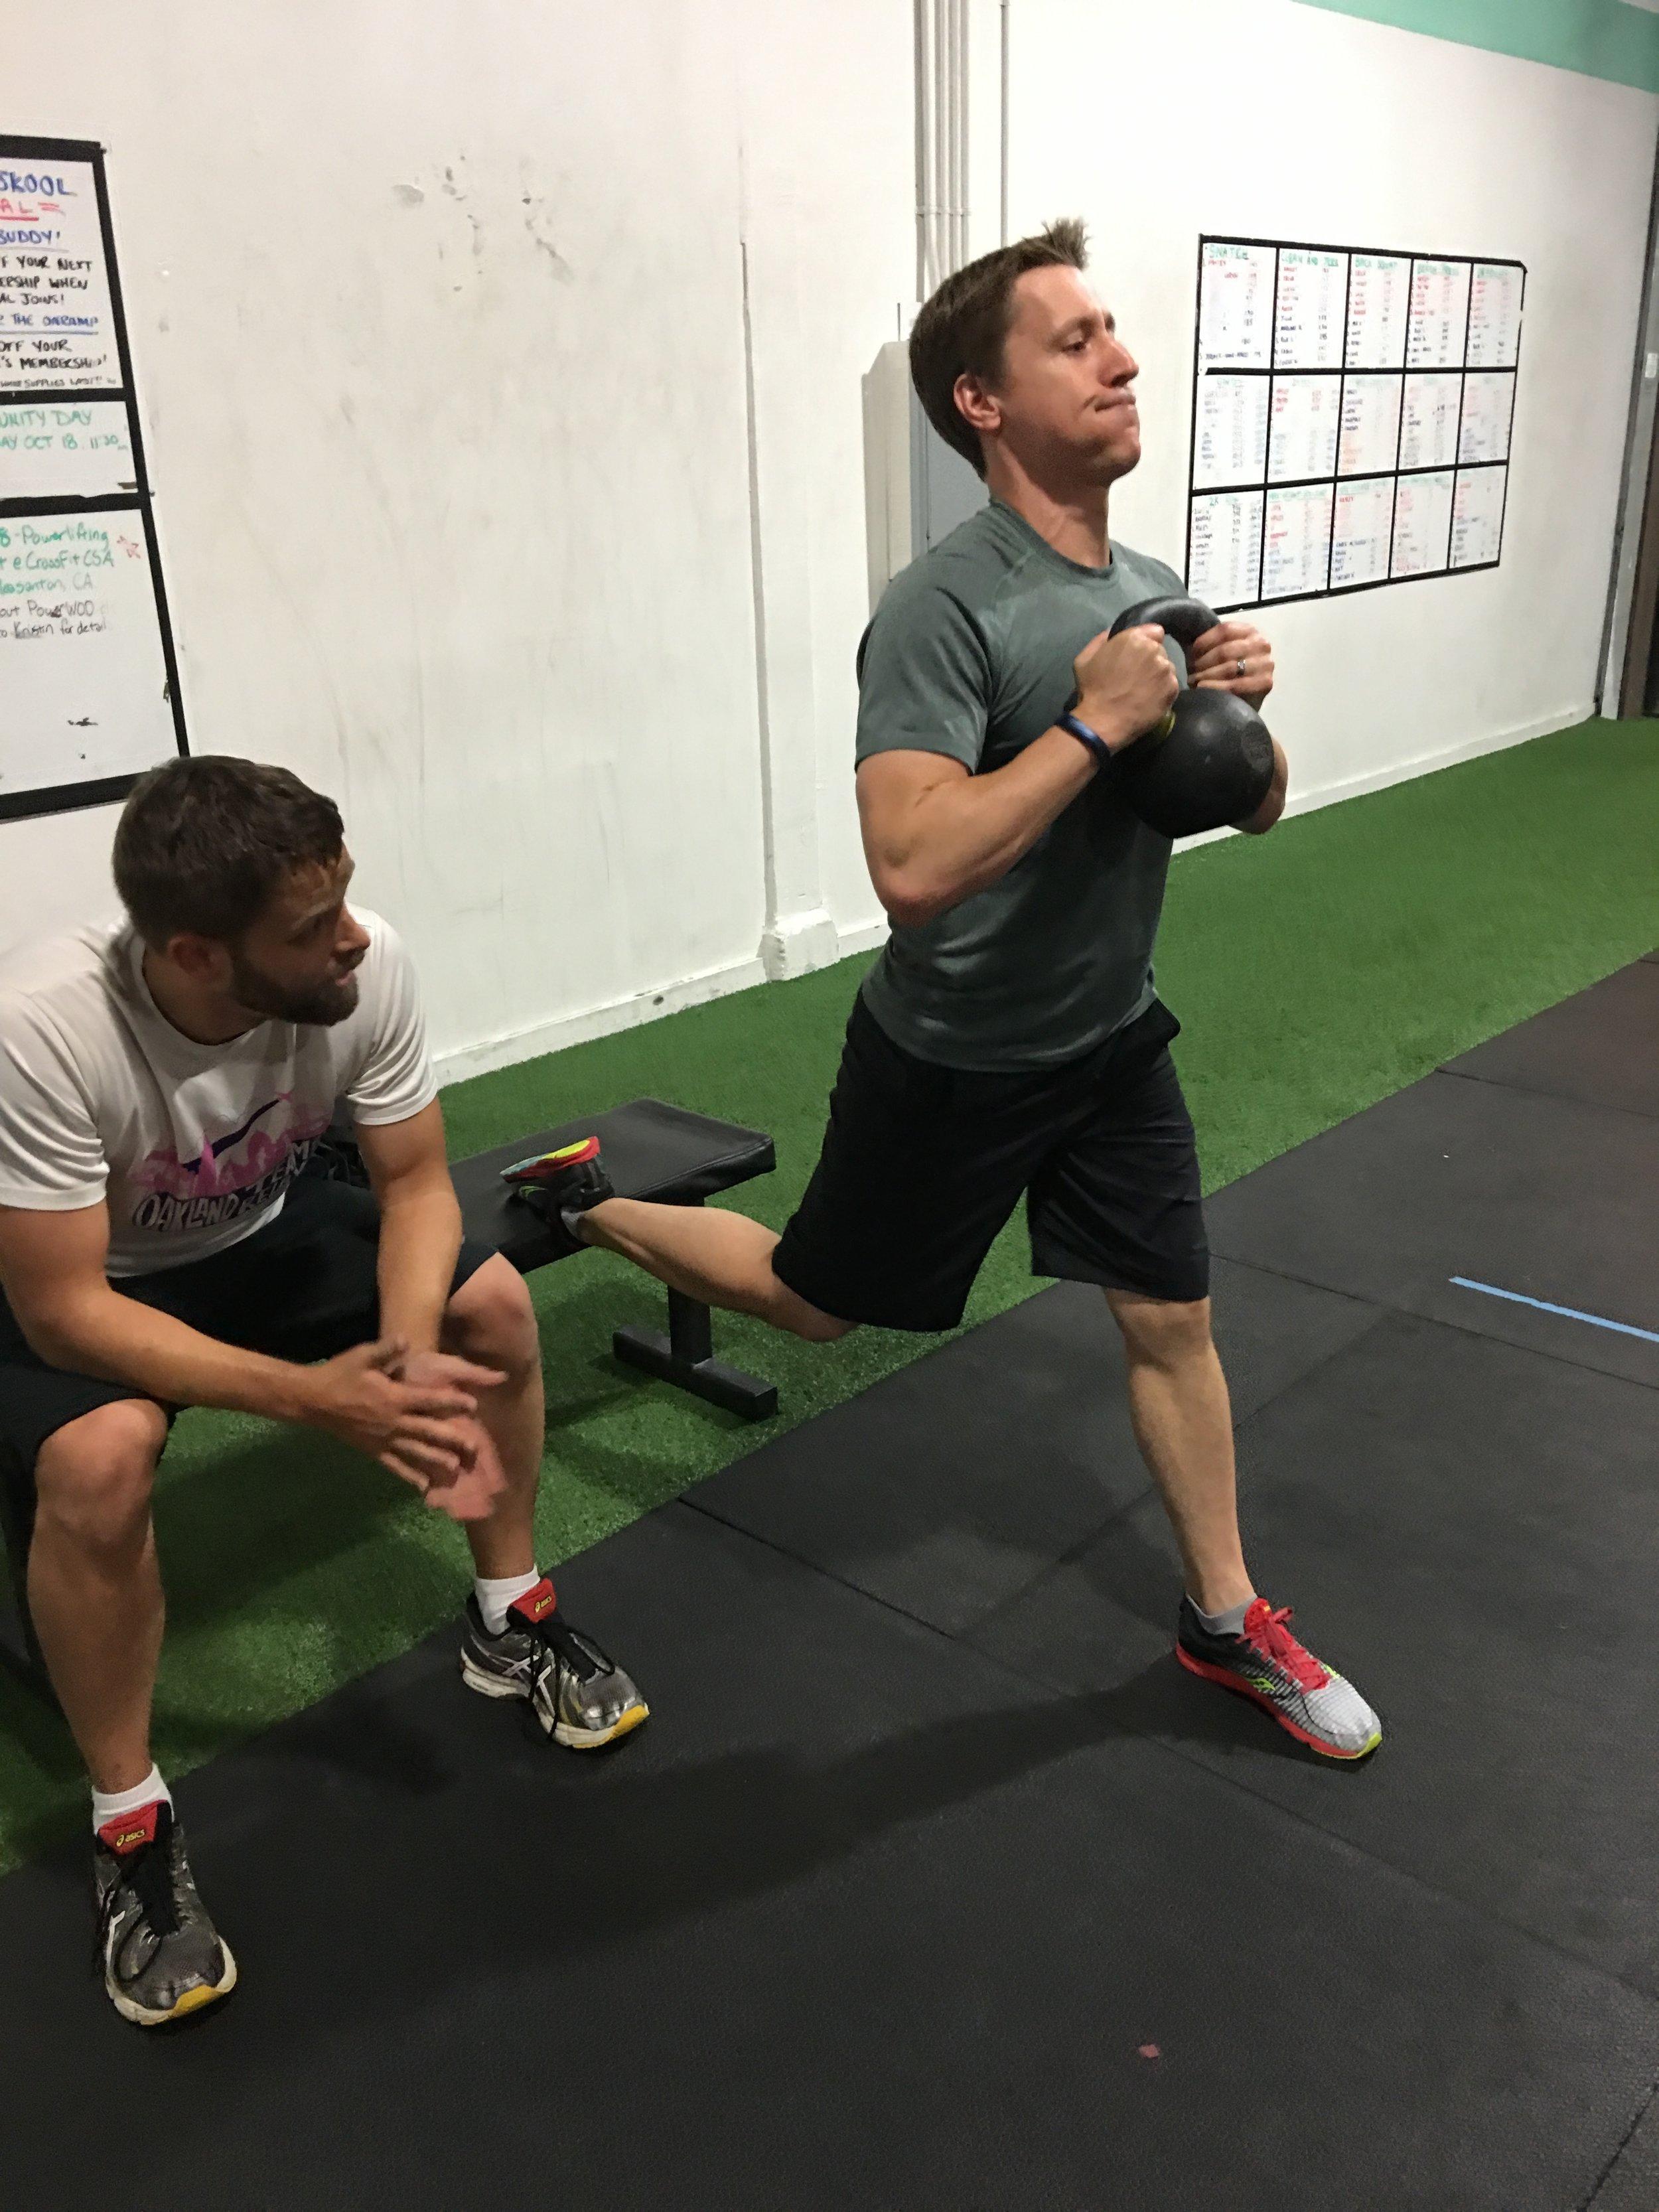 Kevin anchoring Jeremy's split squats